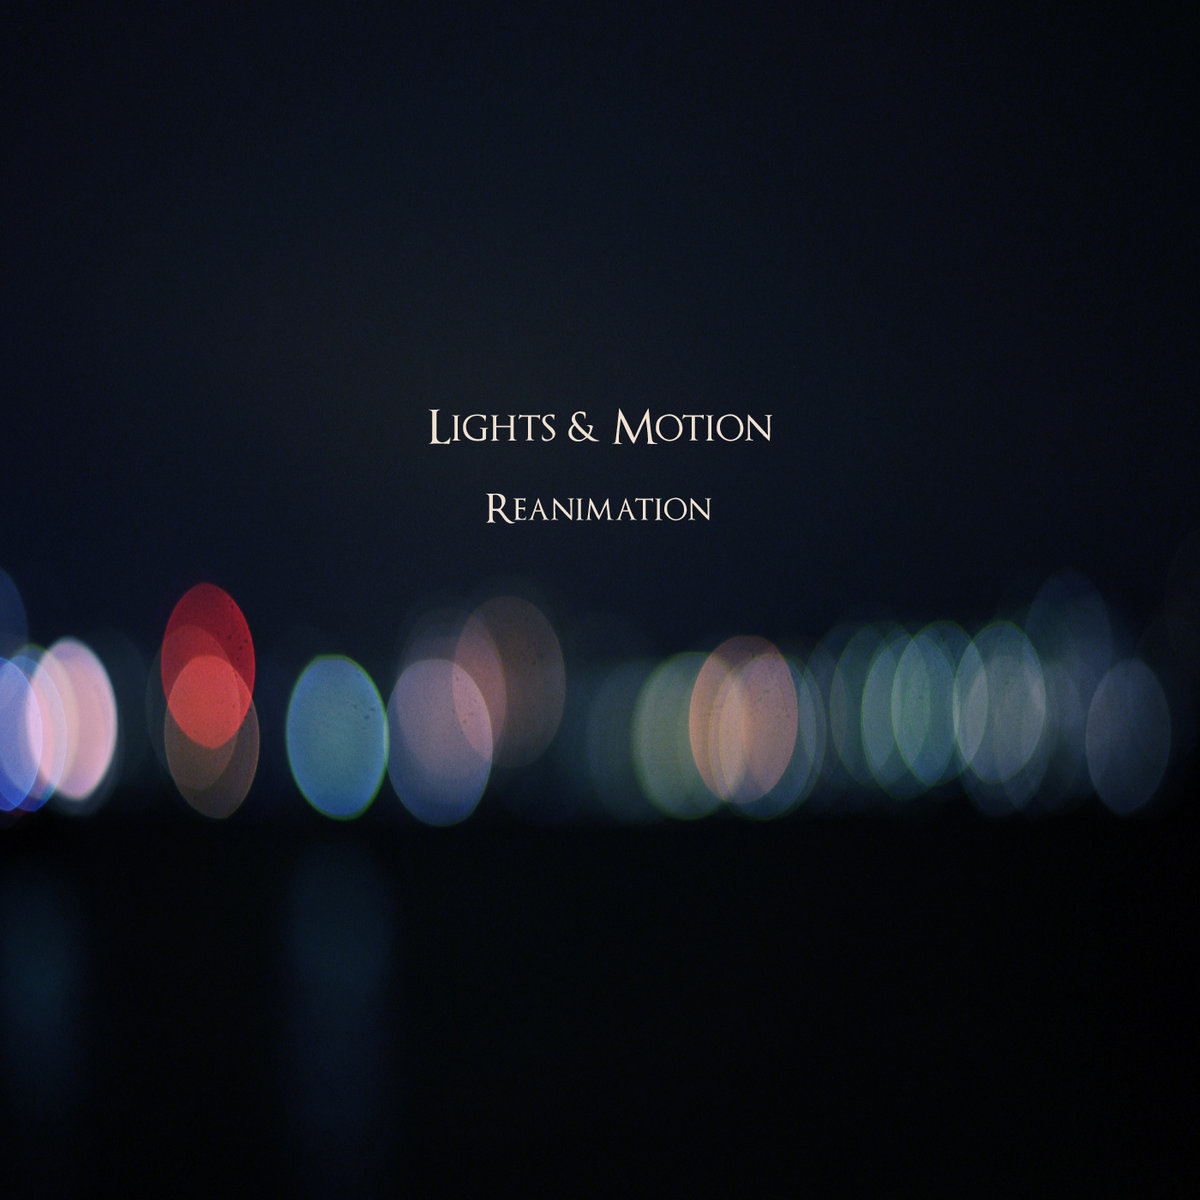 By Lights U0026 Motion Nice Look